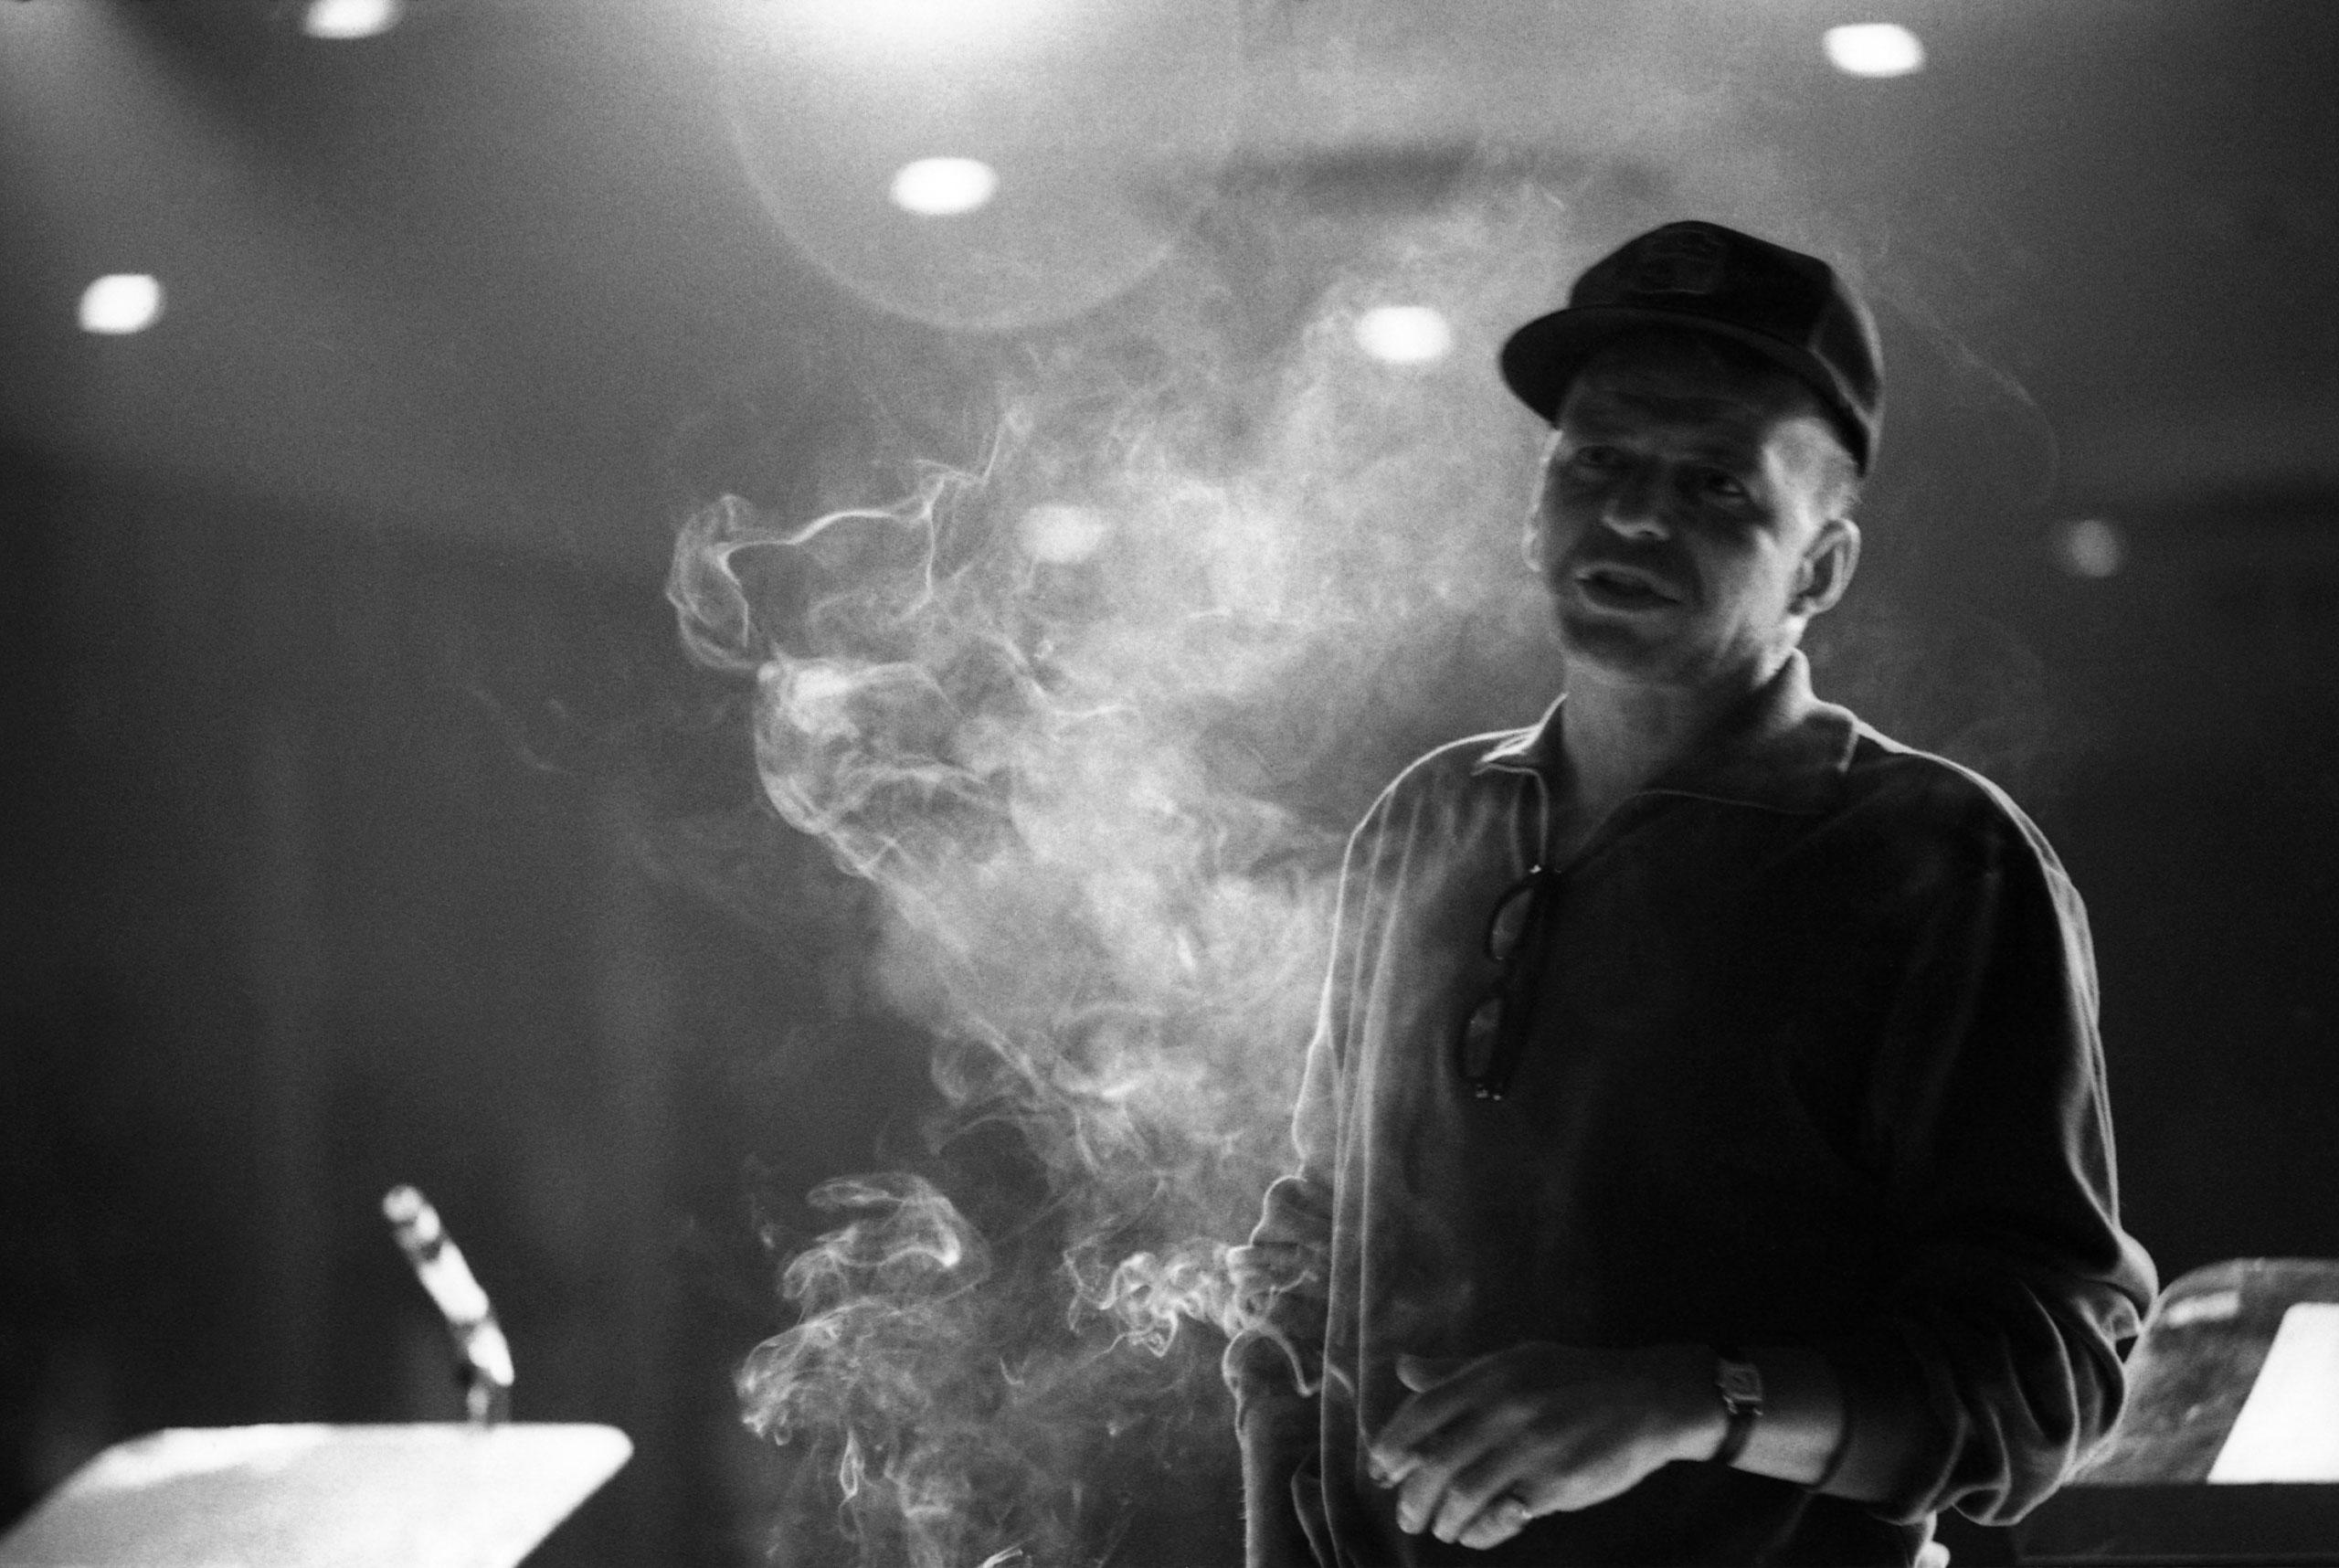 Frank Sinatra in rehearsal, 1965